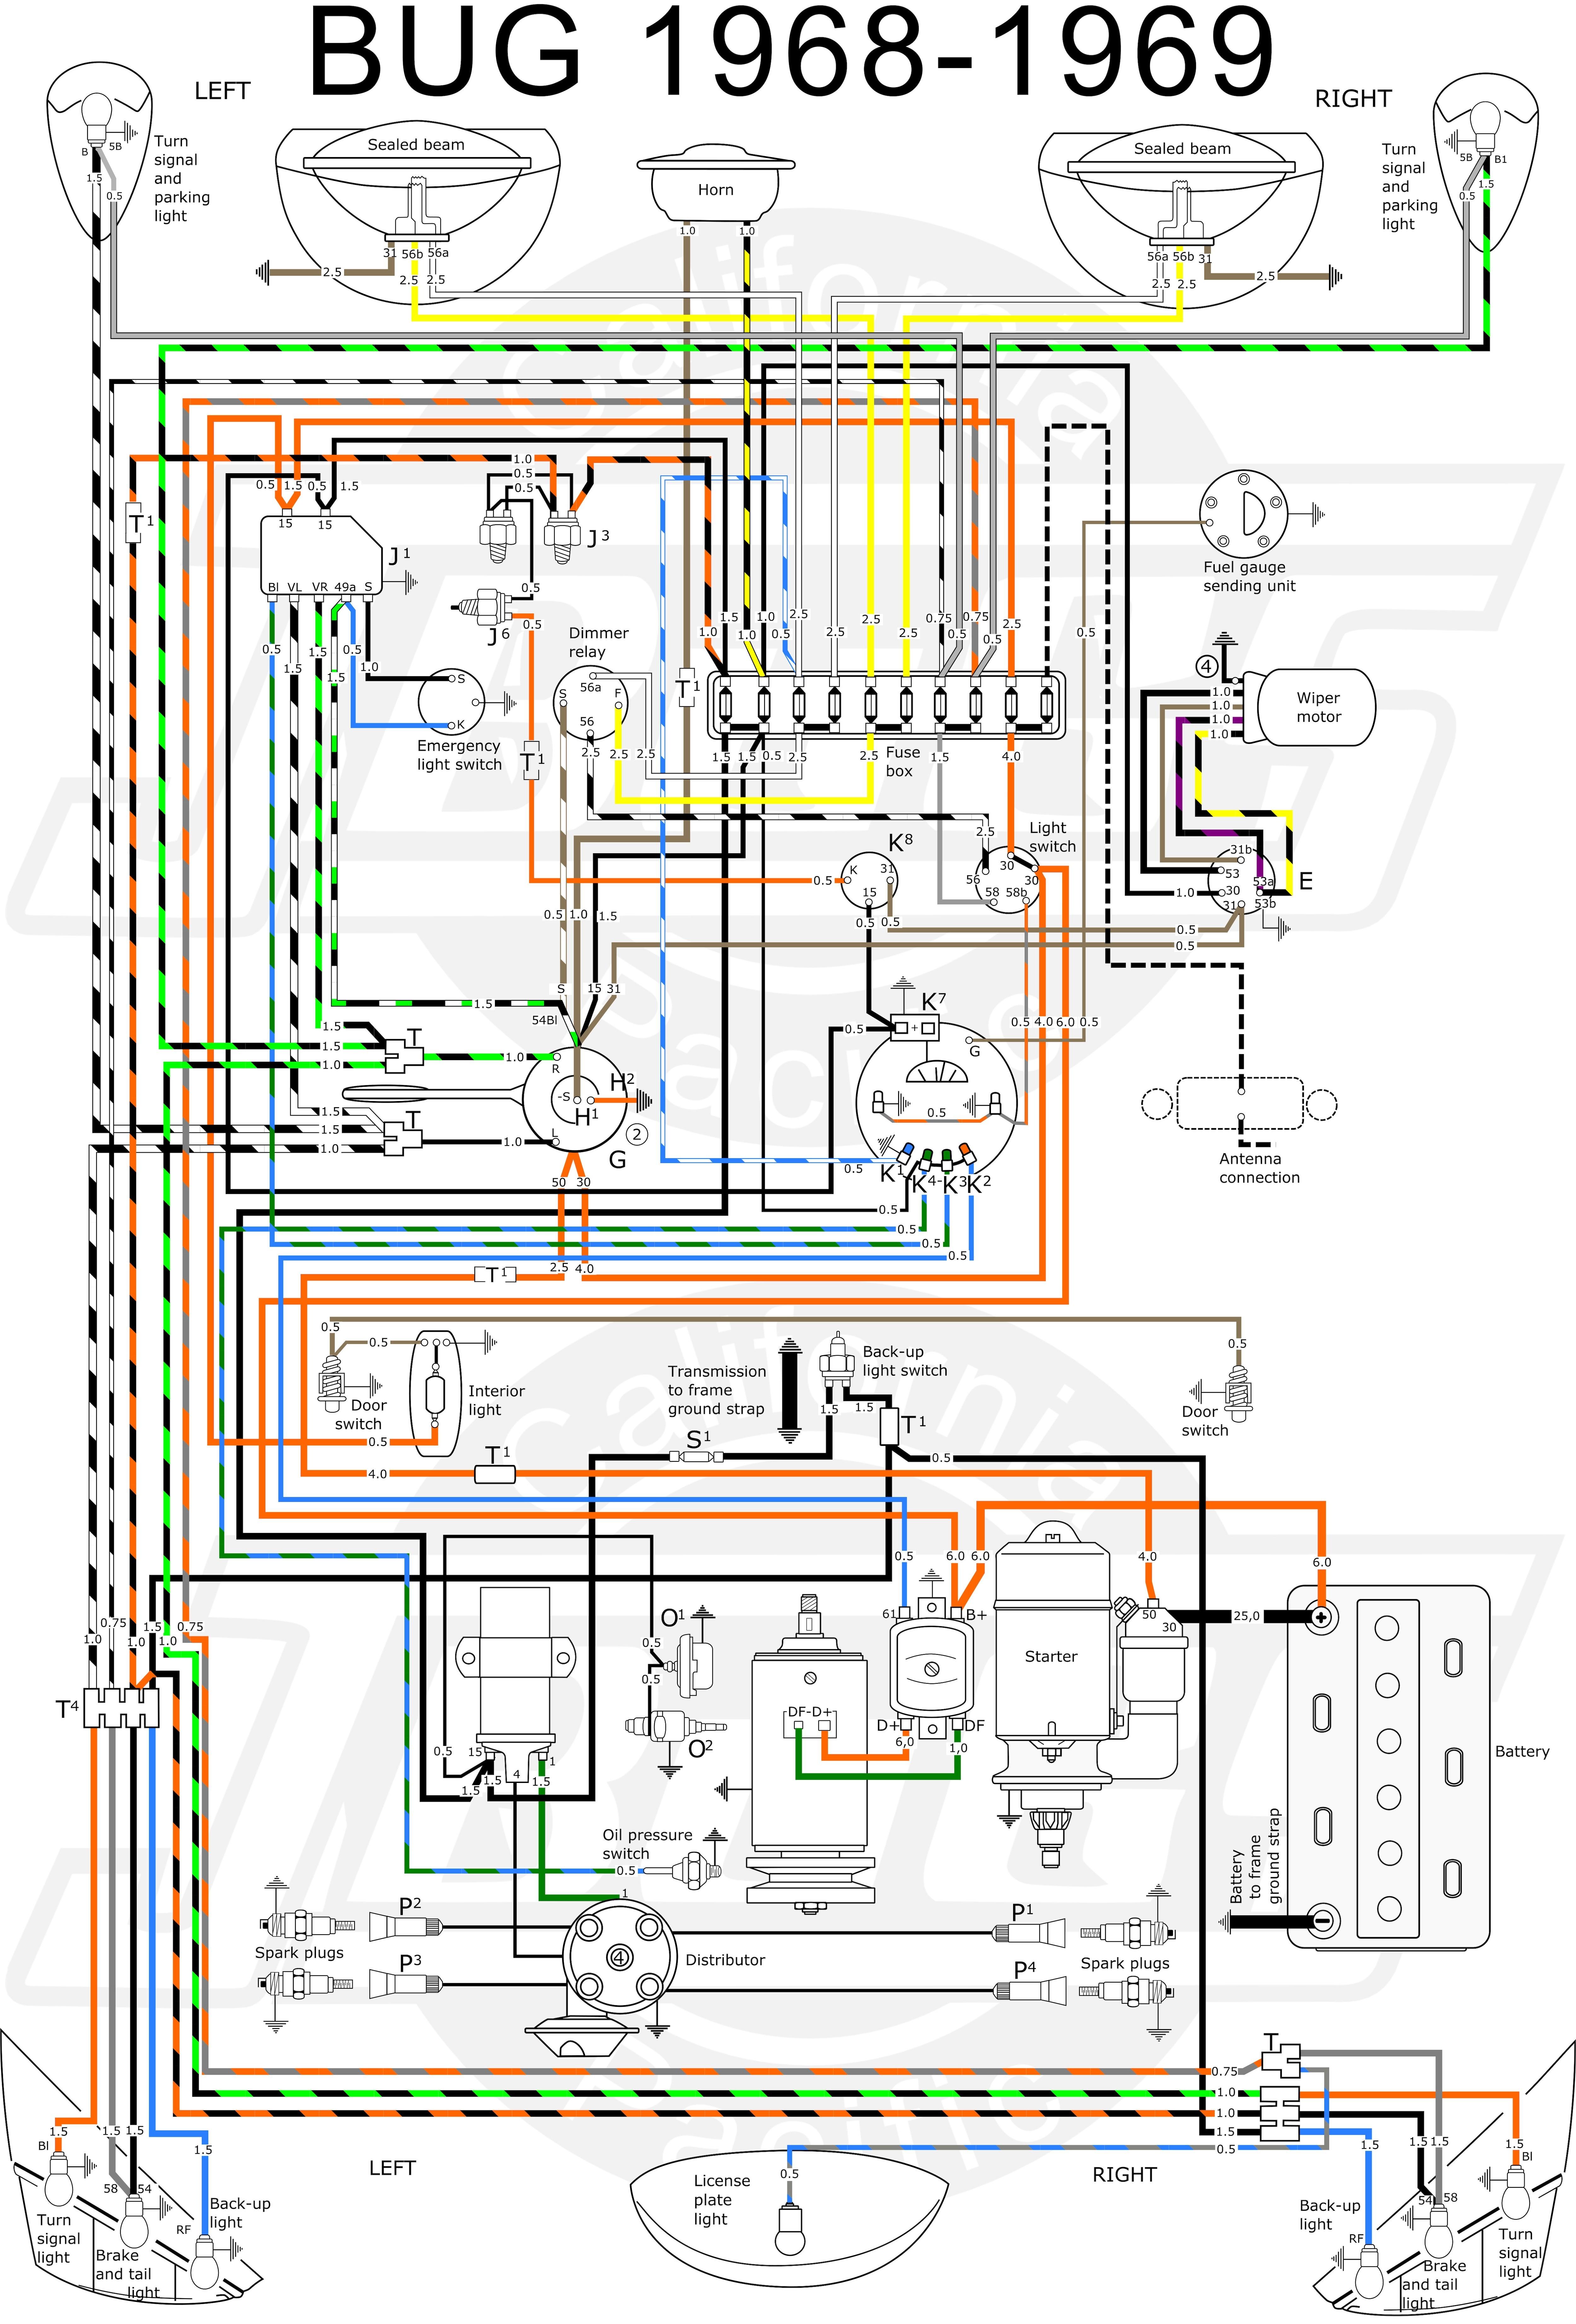 Vw Beetle Wiring Diagram 1969 Vw Bug Instrument Light Wiring List Schematic Circuit